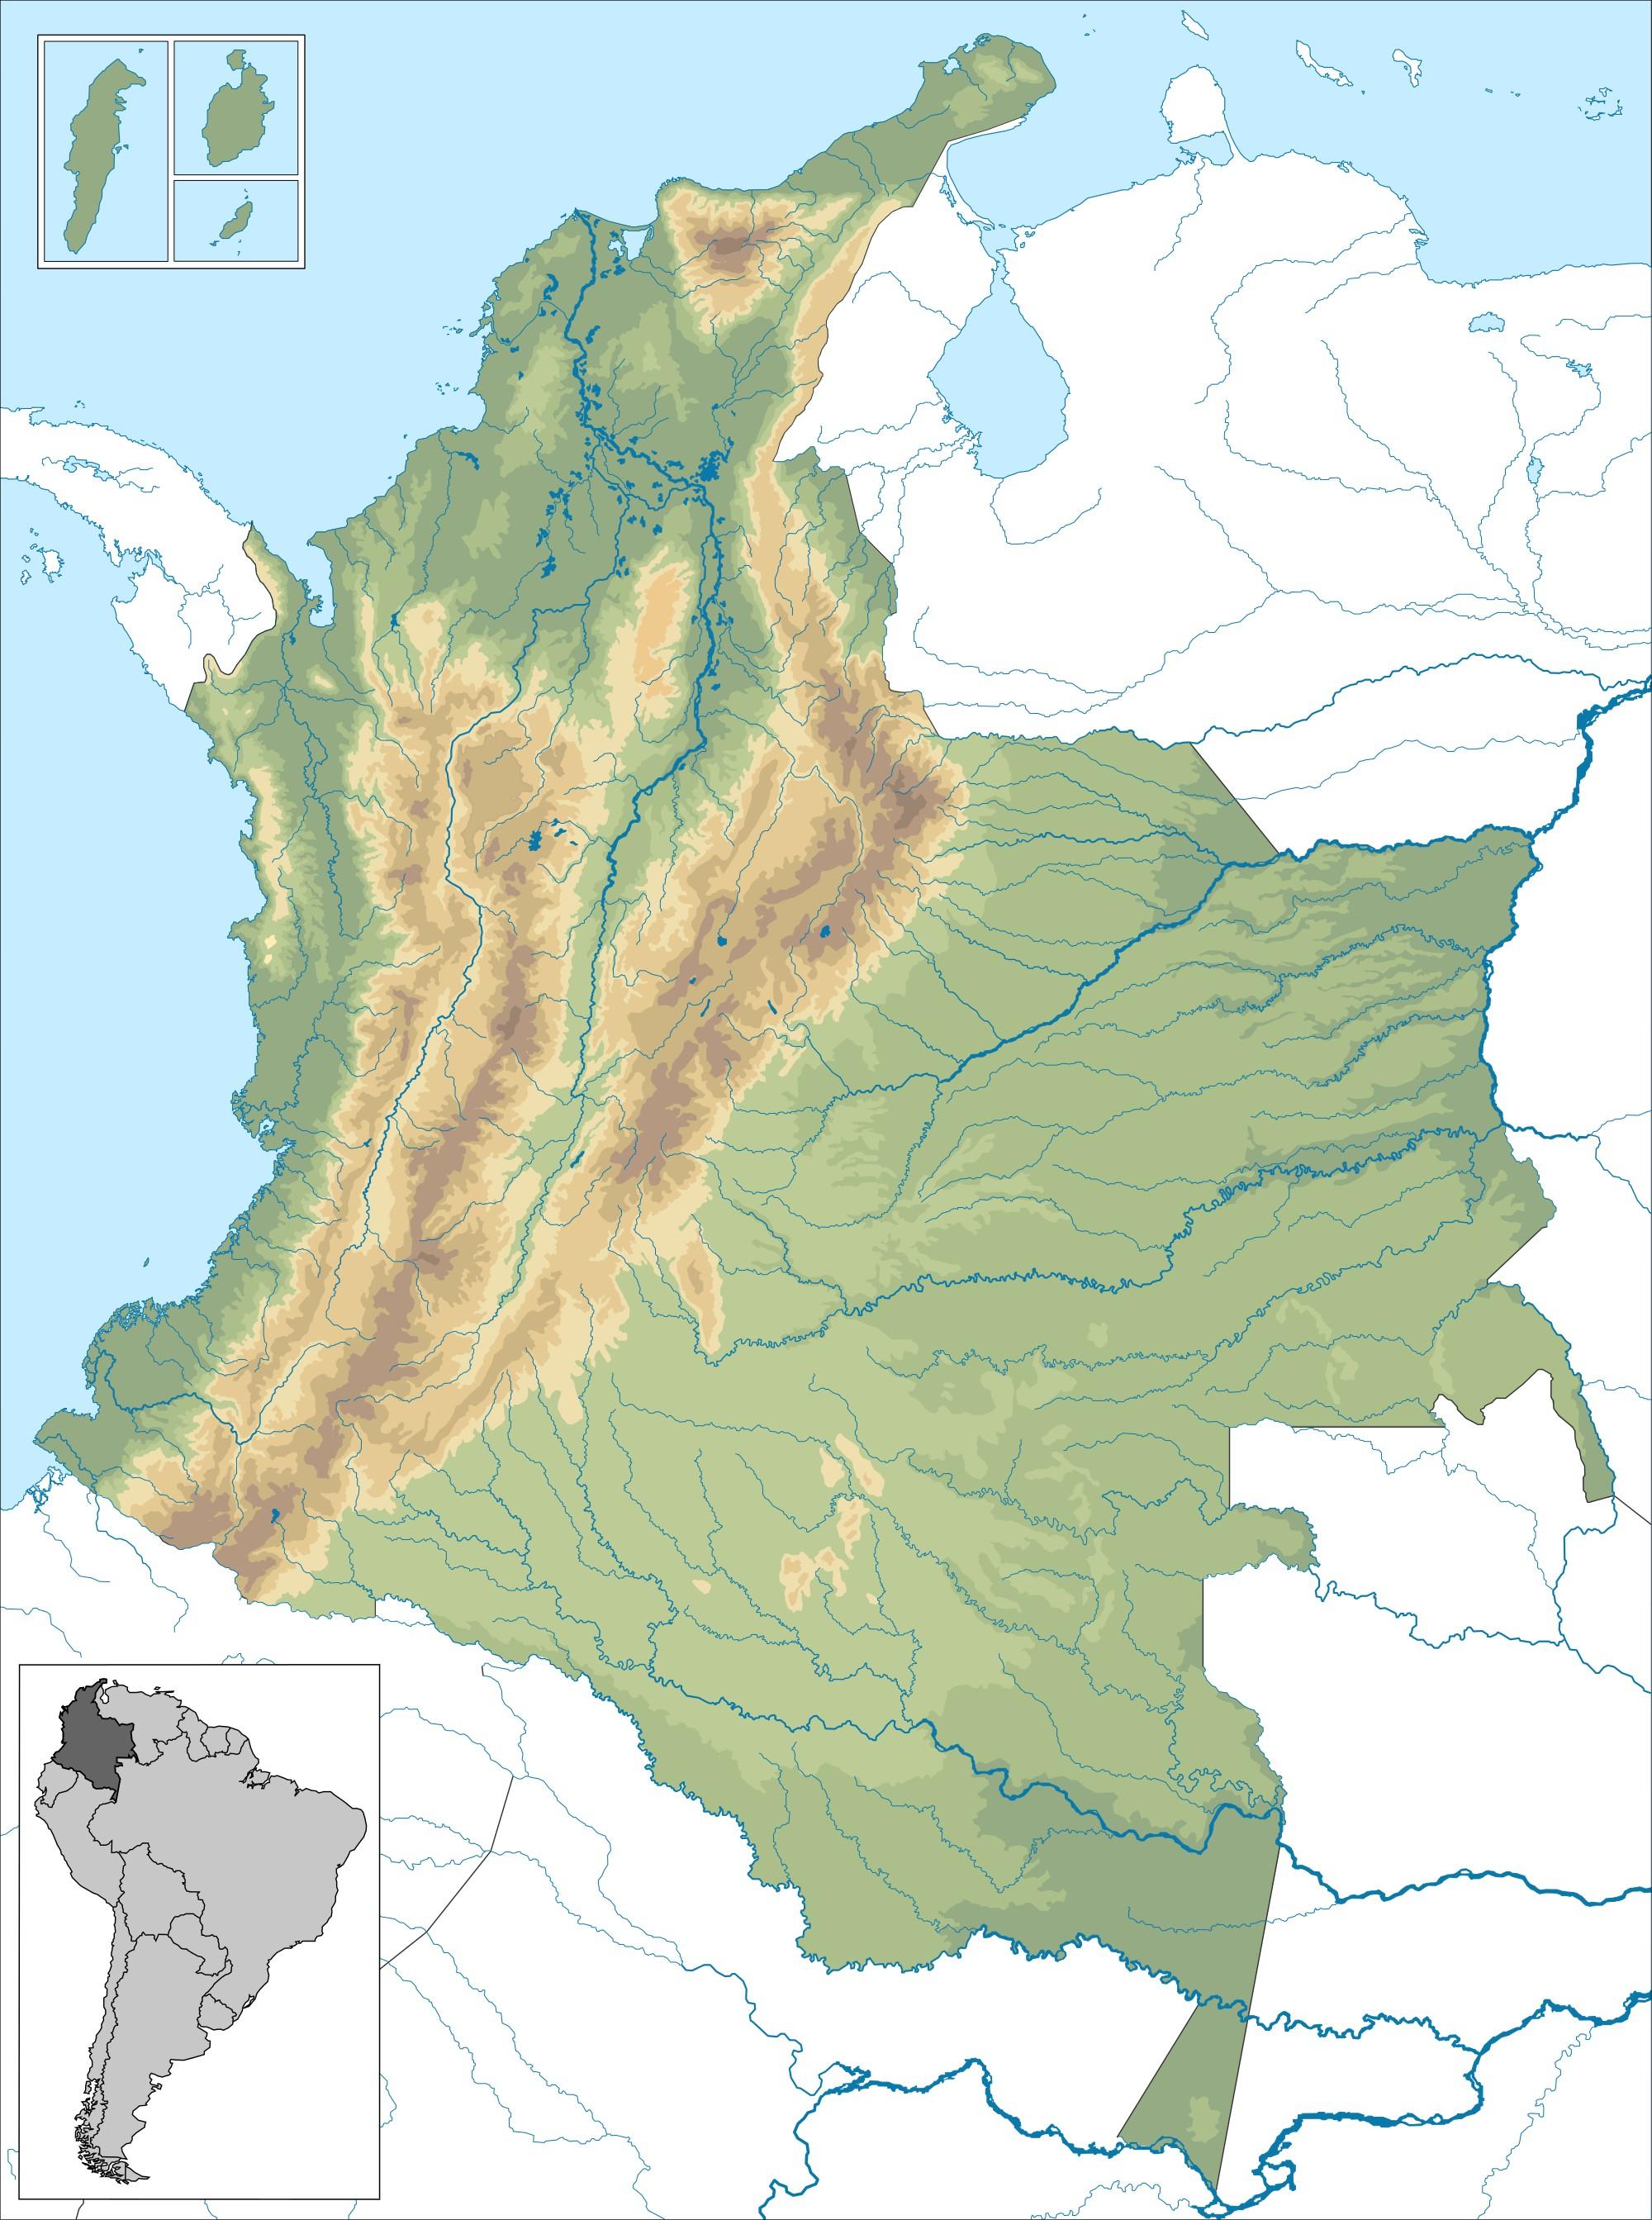 Calendario 2019 02 Uac Más Arriba-a-fecha Eastern Hills Bogotá Of Calendario 2019 02 Uac Más Recientemente Liberado Full issue